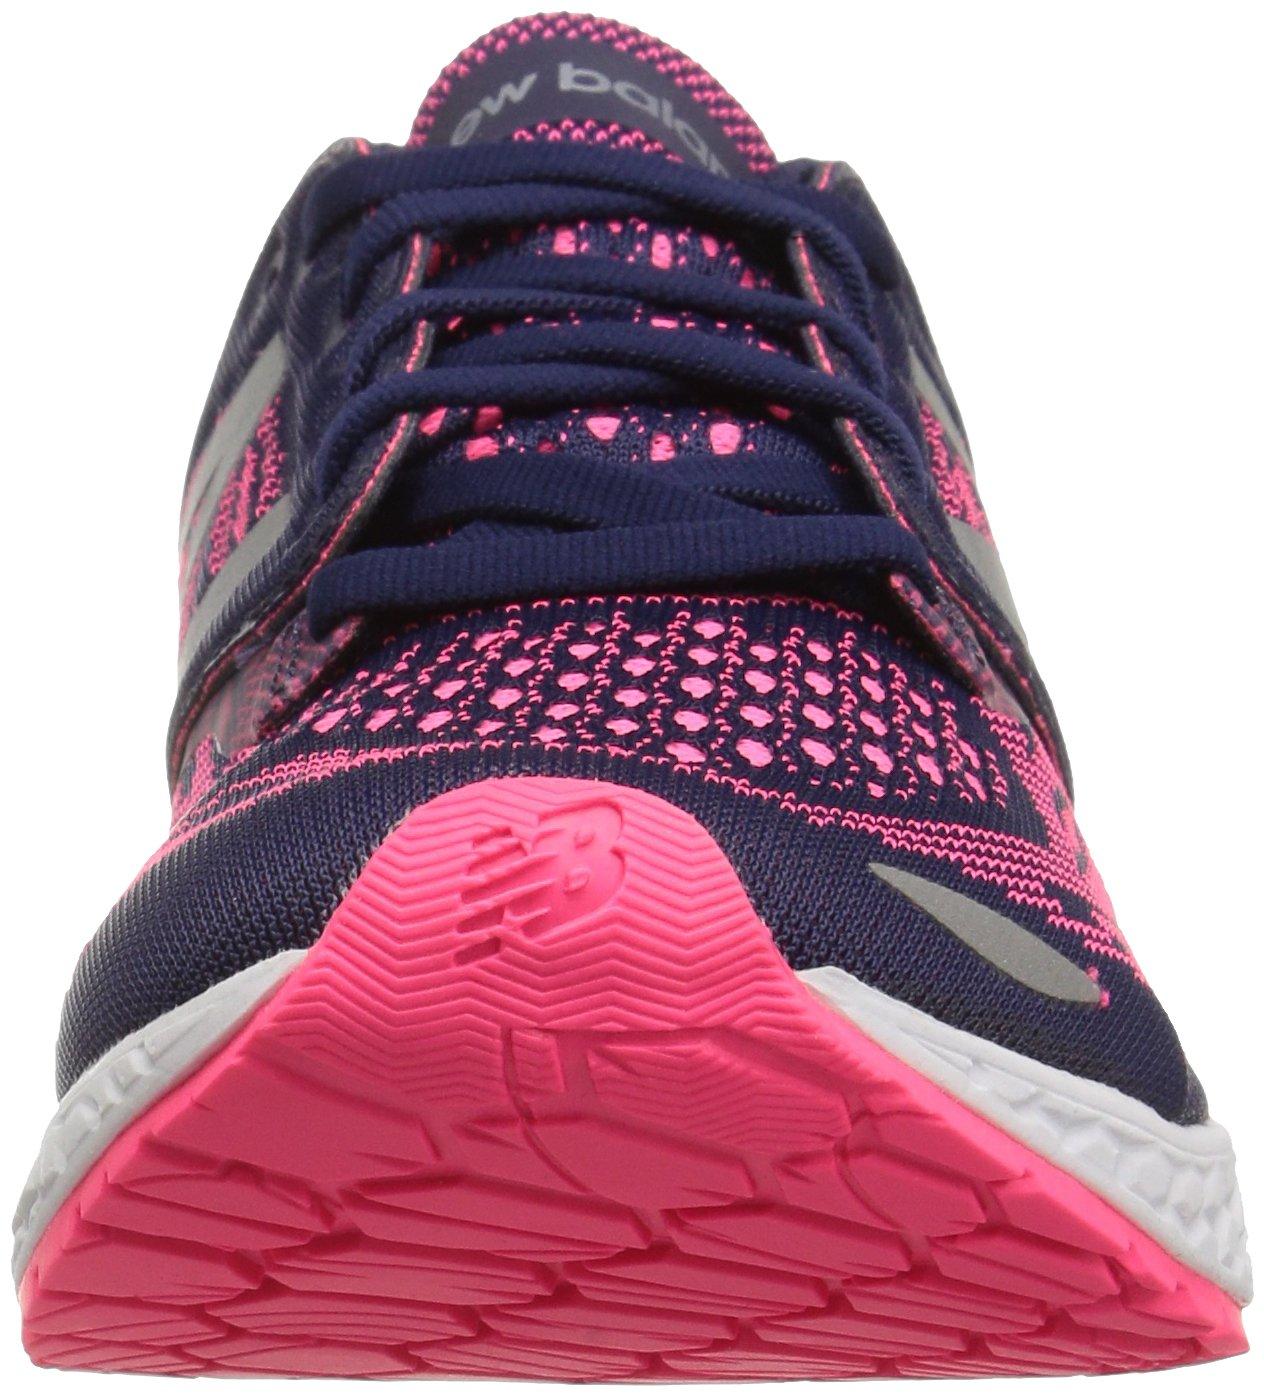 New Balance Women's ZanteV2 Breathe Running Shoe B01FSJ59DK 8 D US|Dark Denim/Alpha Pink